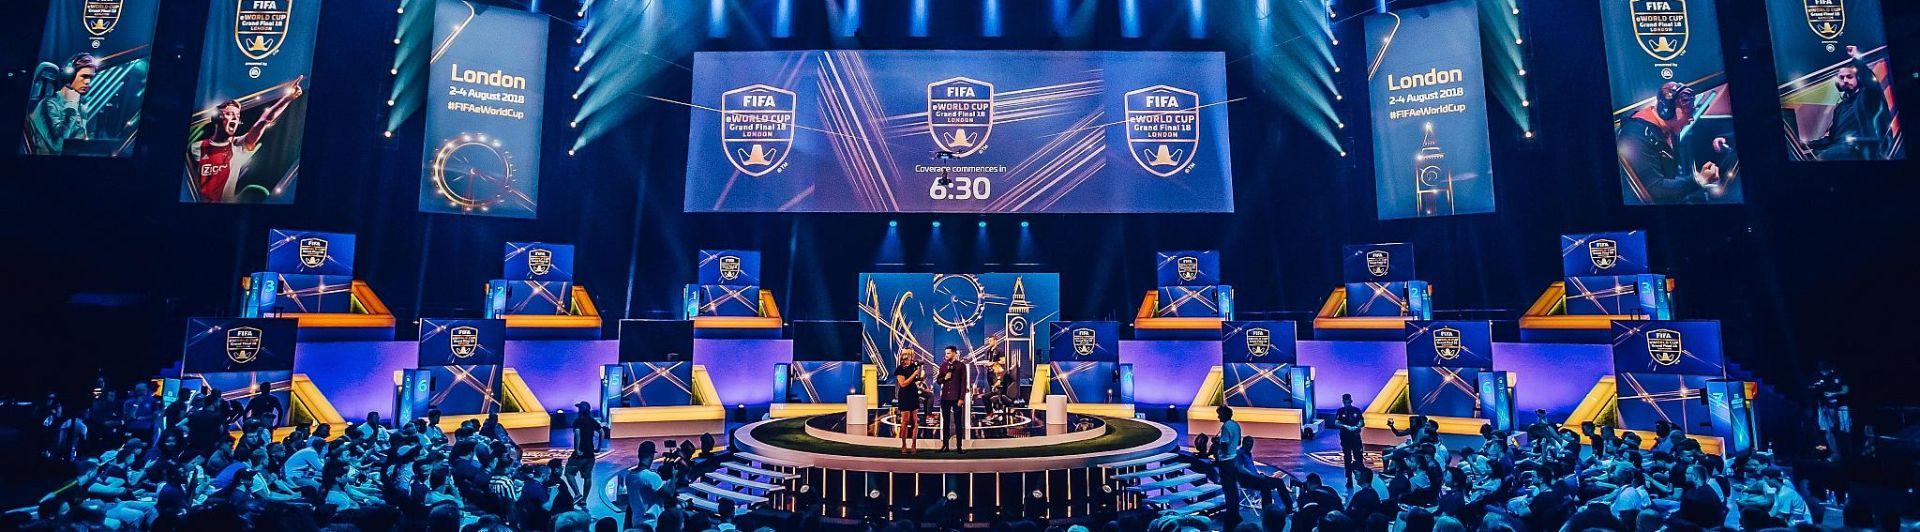 FIFA eWorld Cup 2018 - 4th August 2018 by Luke Dyson - IMG_0075.jpg